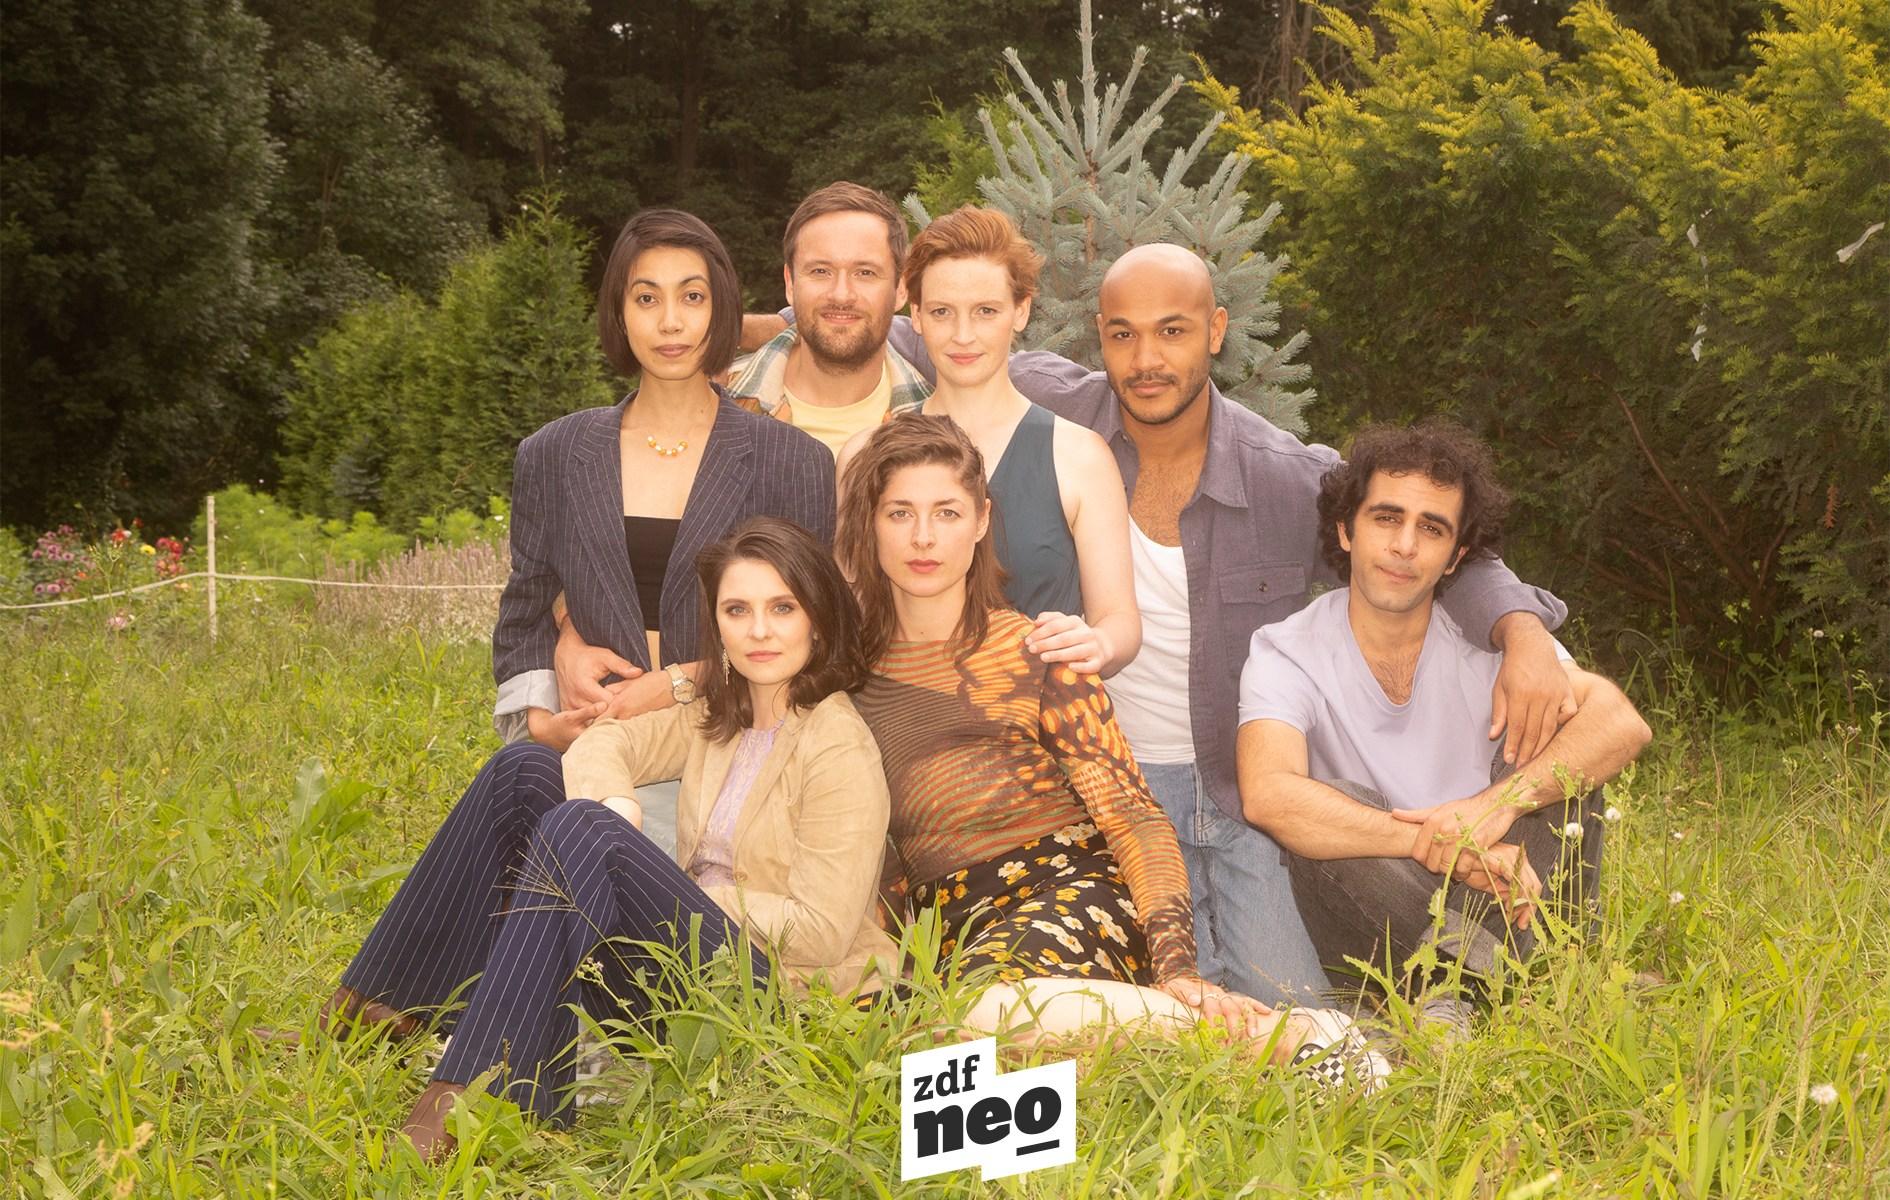 Copyright ZDF | Neven Allgeier